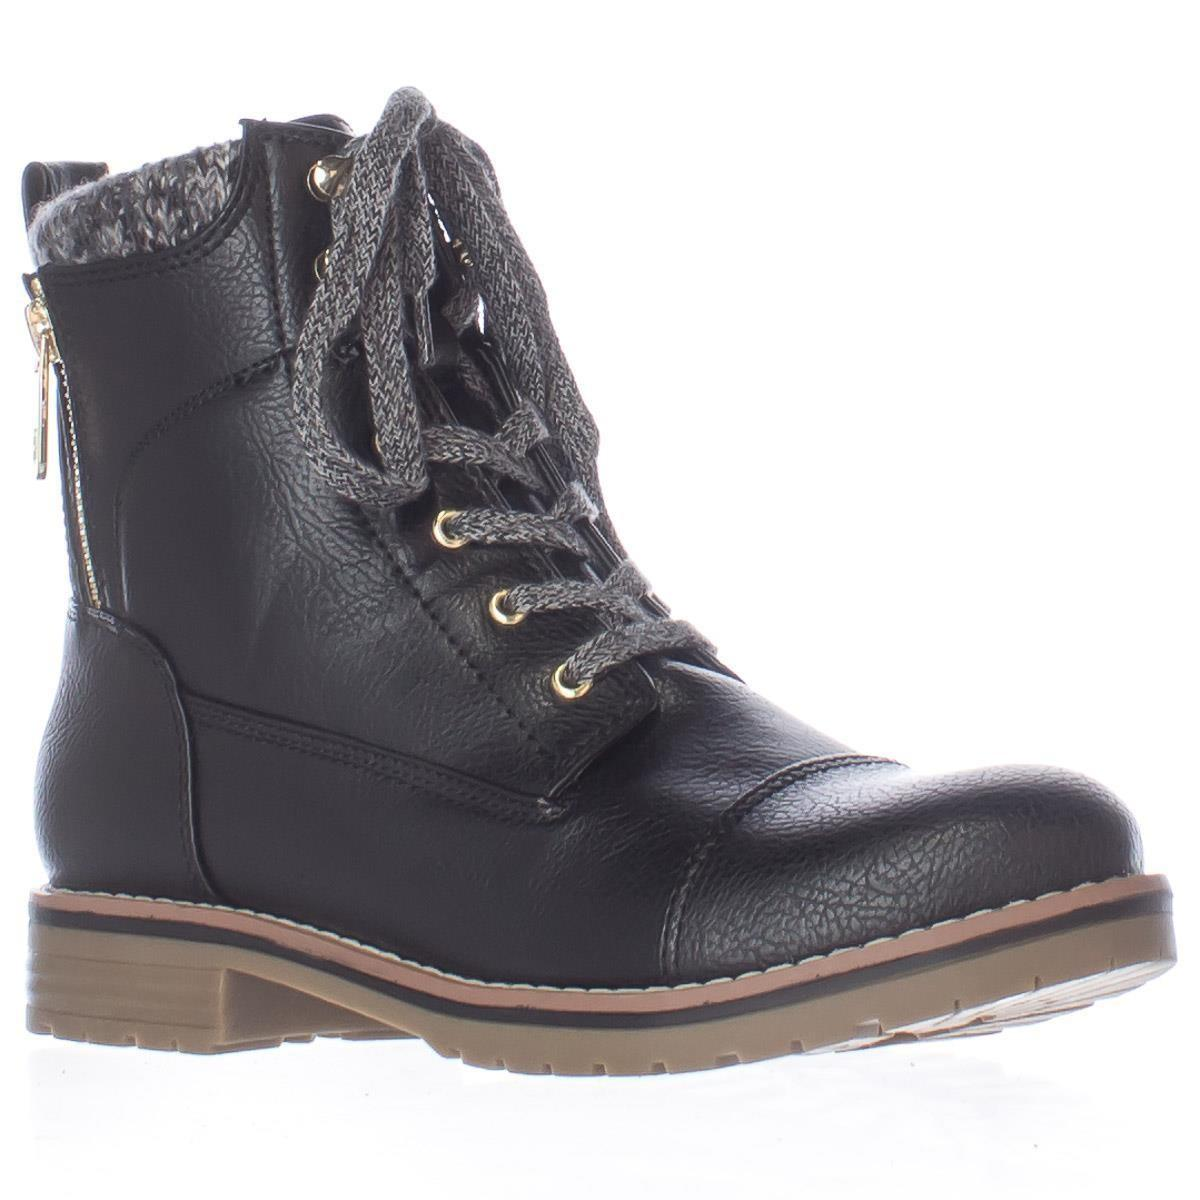 hilfiger omar2 knit top combat boots in black lyst